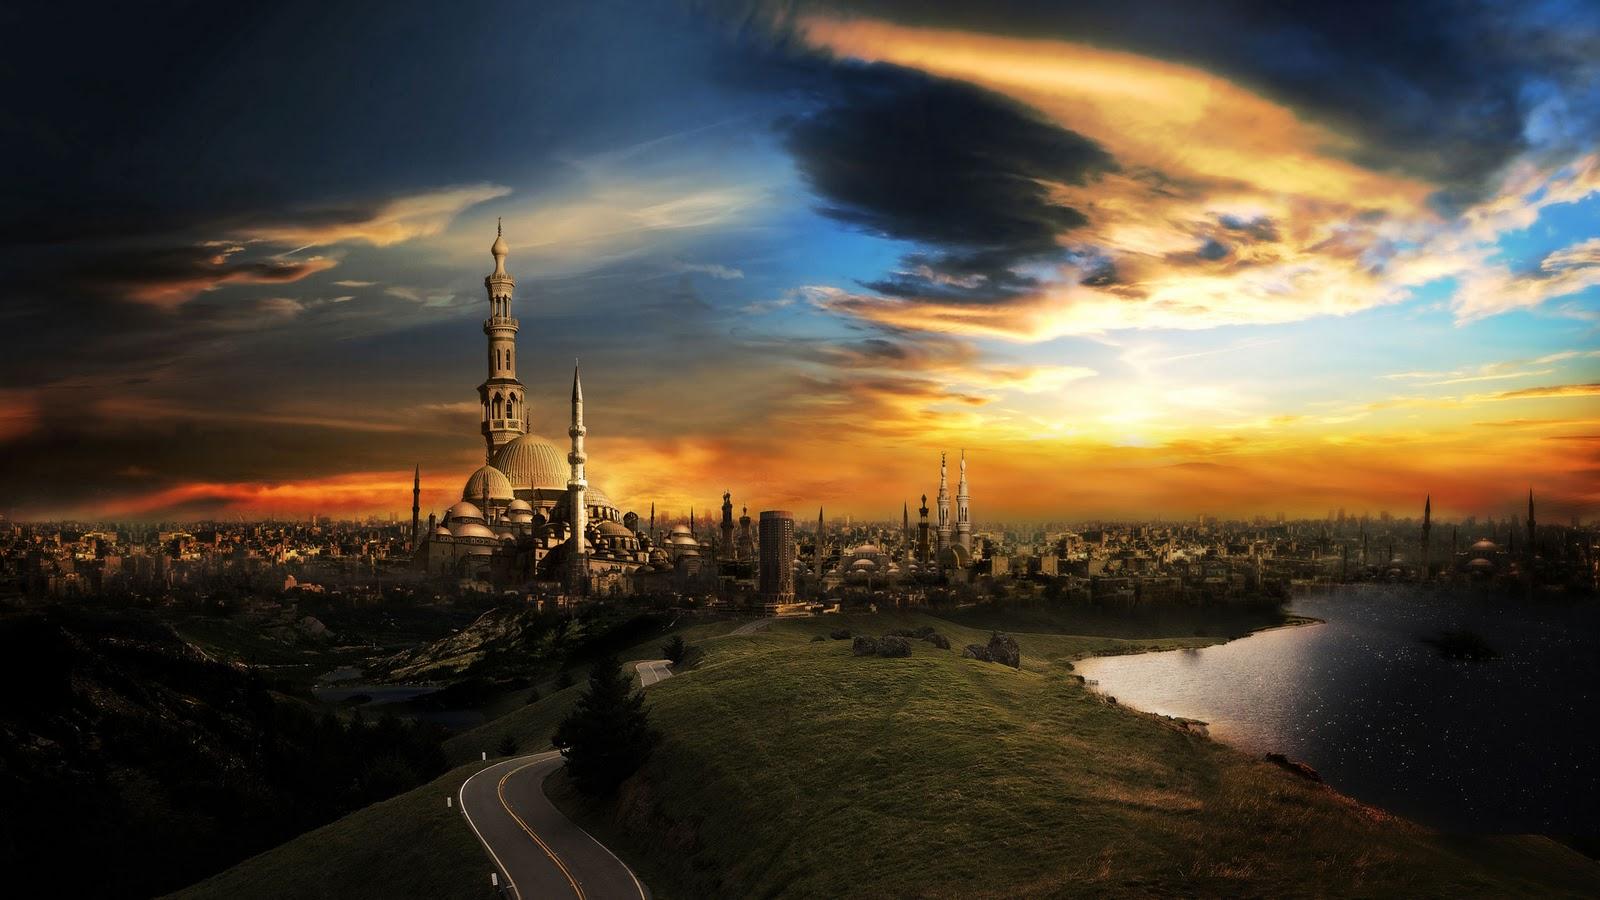 City Wallpaper geeksbowlcom High Definition 1080p HD 39jpg 1600x900